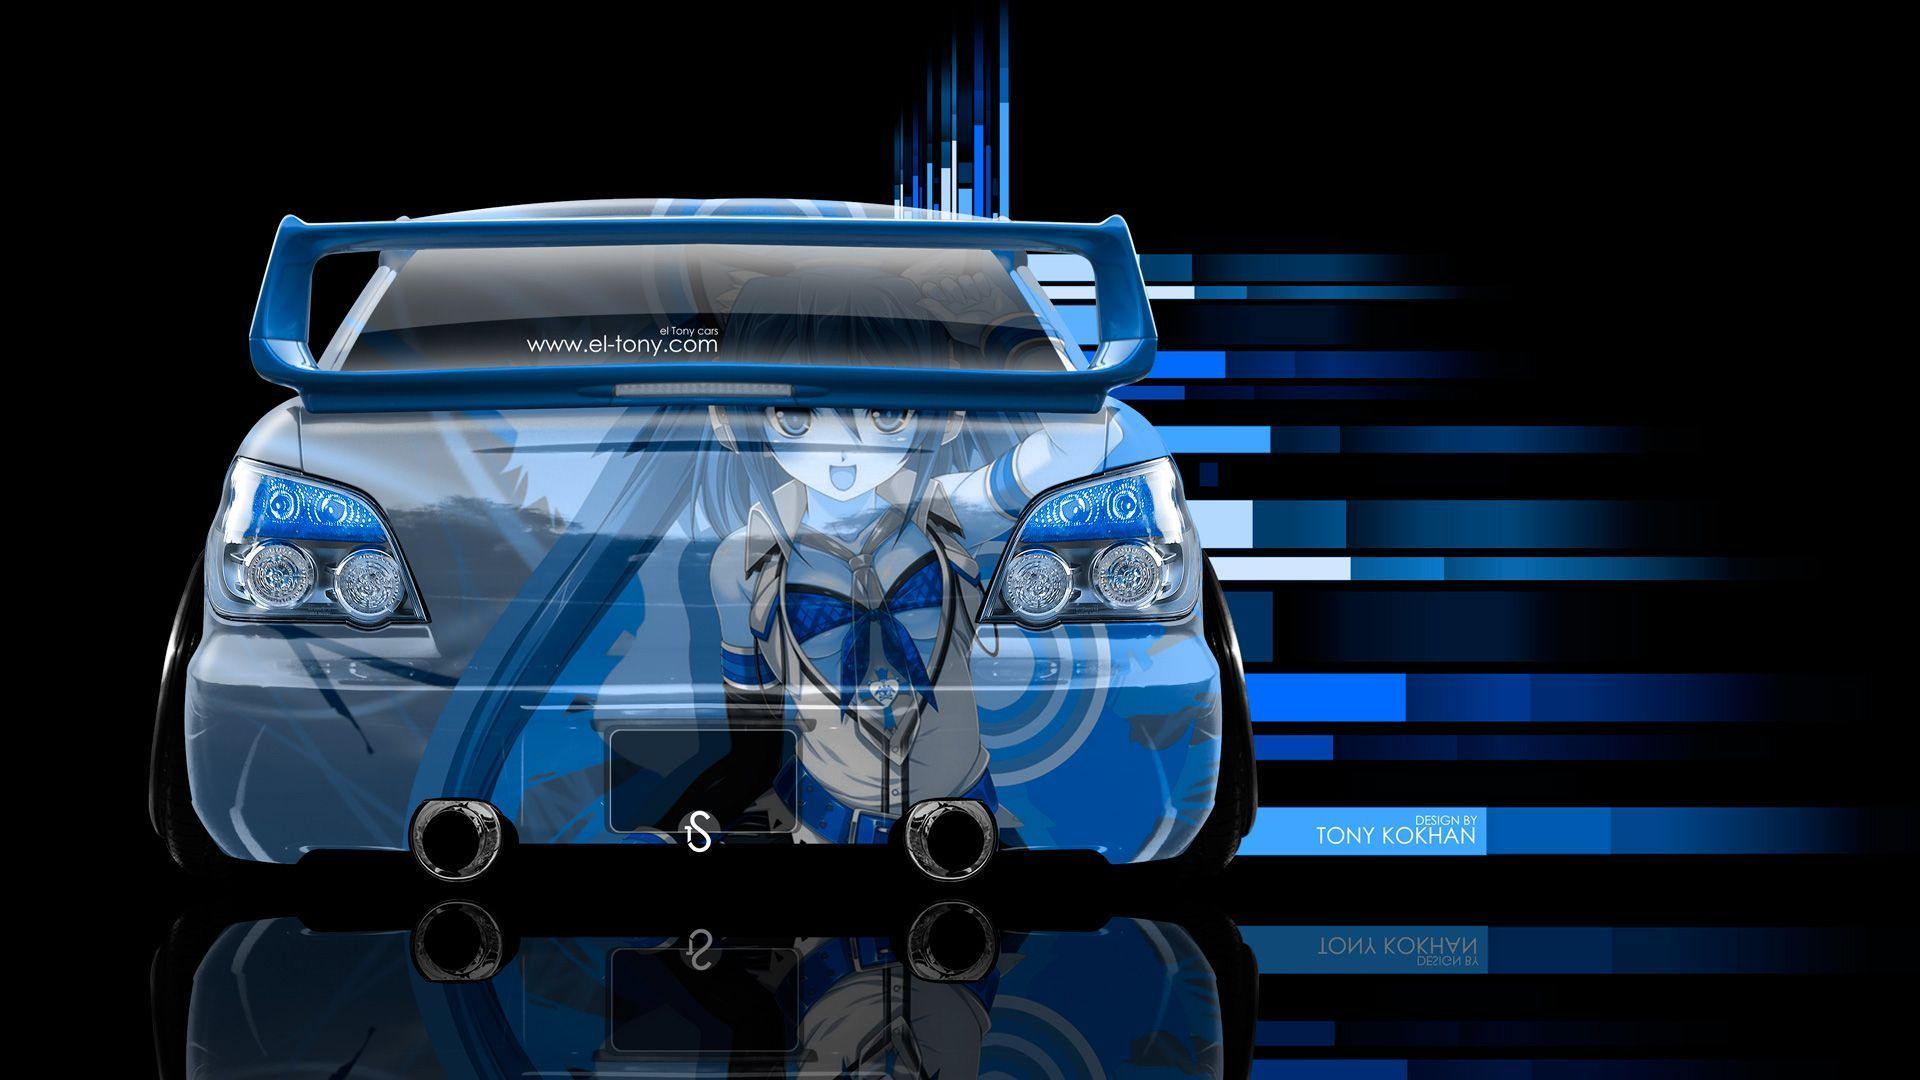 Subaru wrx jdm sti cars hd wallpaper - Subaru Impreza Wrx Sti Jdm Back Anime Aerography Car 2014 El Tony